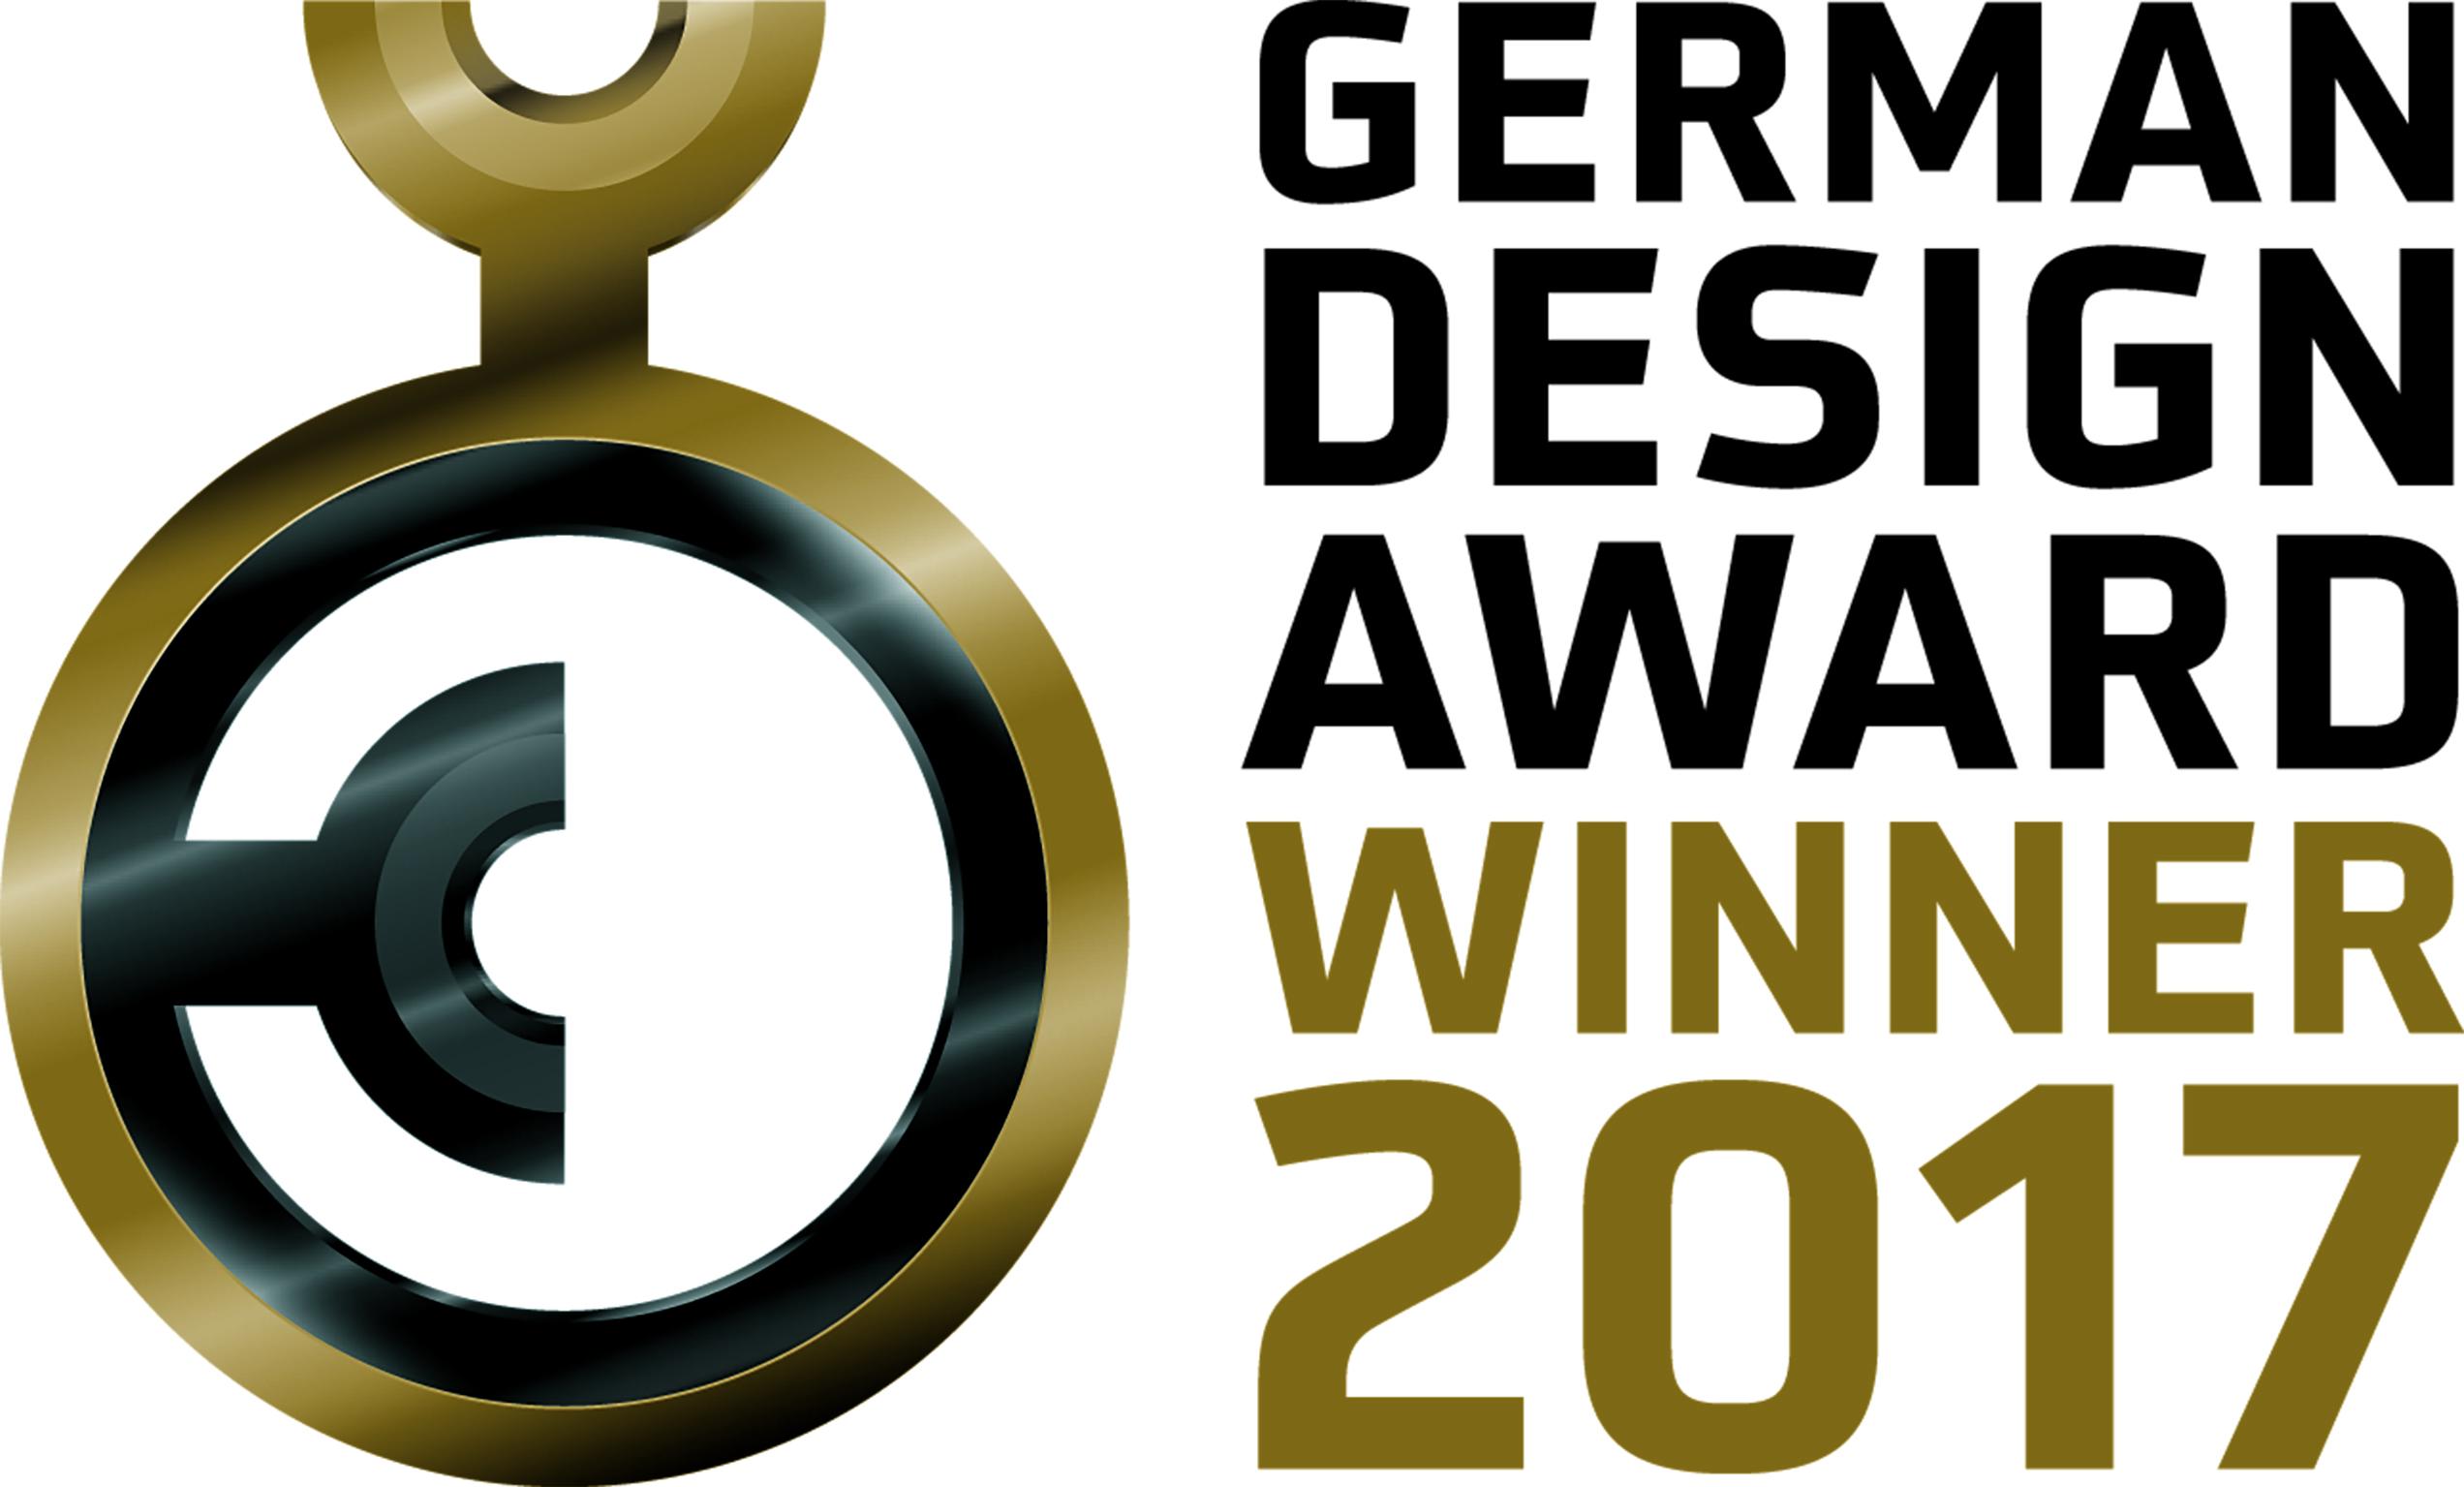 Two German Design Awards 2017 for Schüco, Schüco Germany.